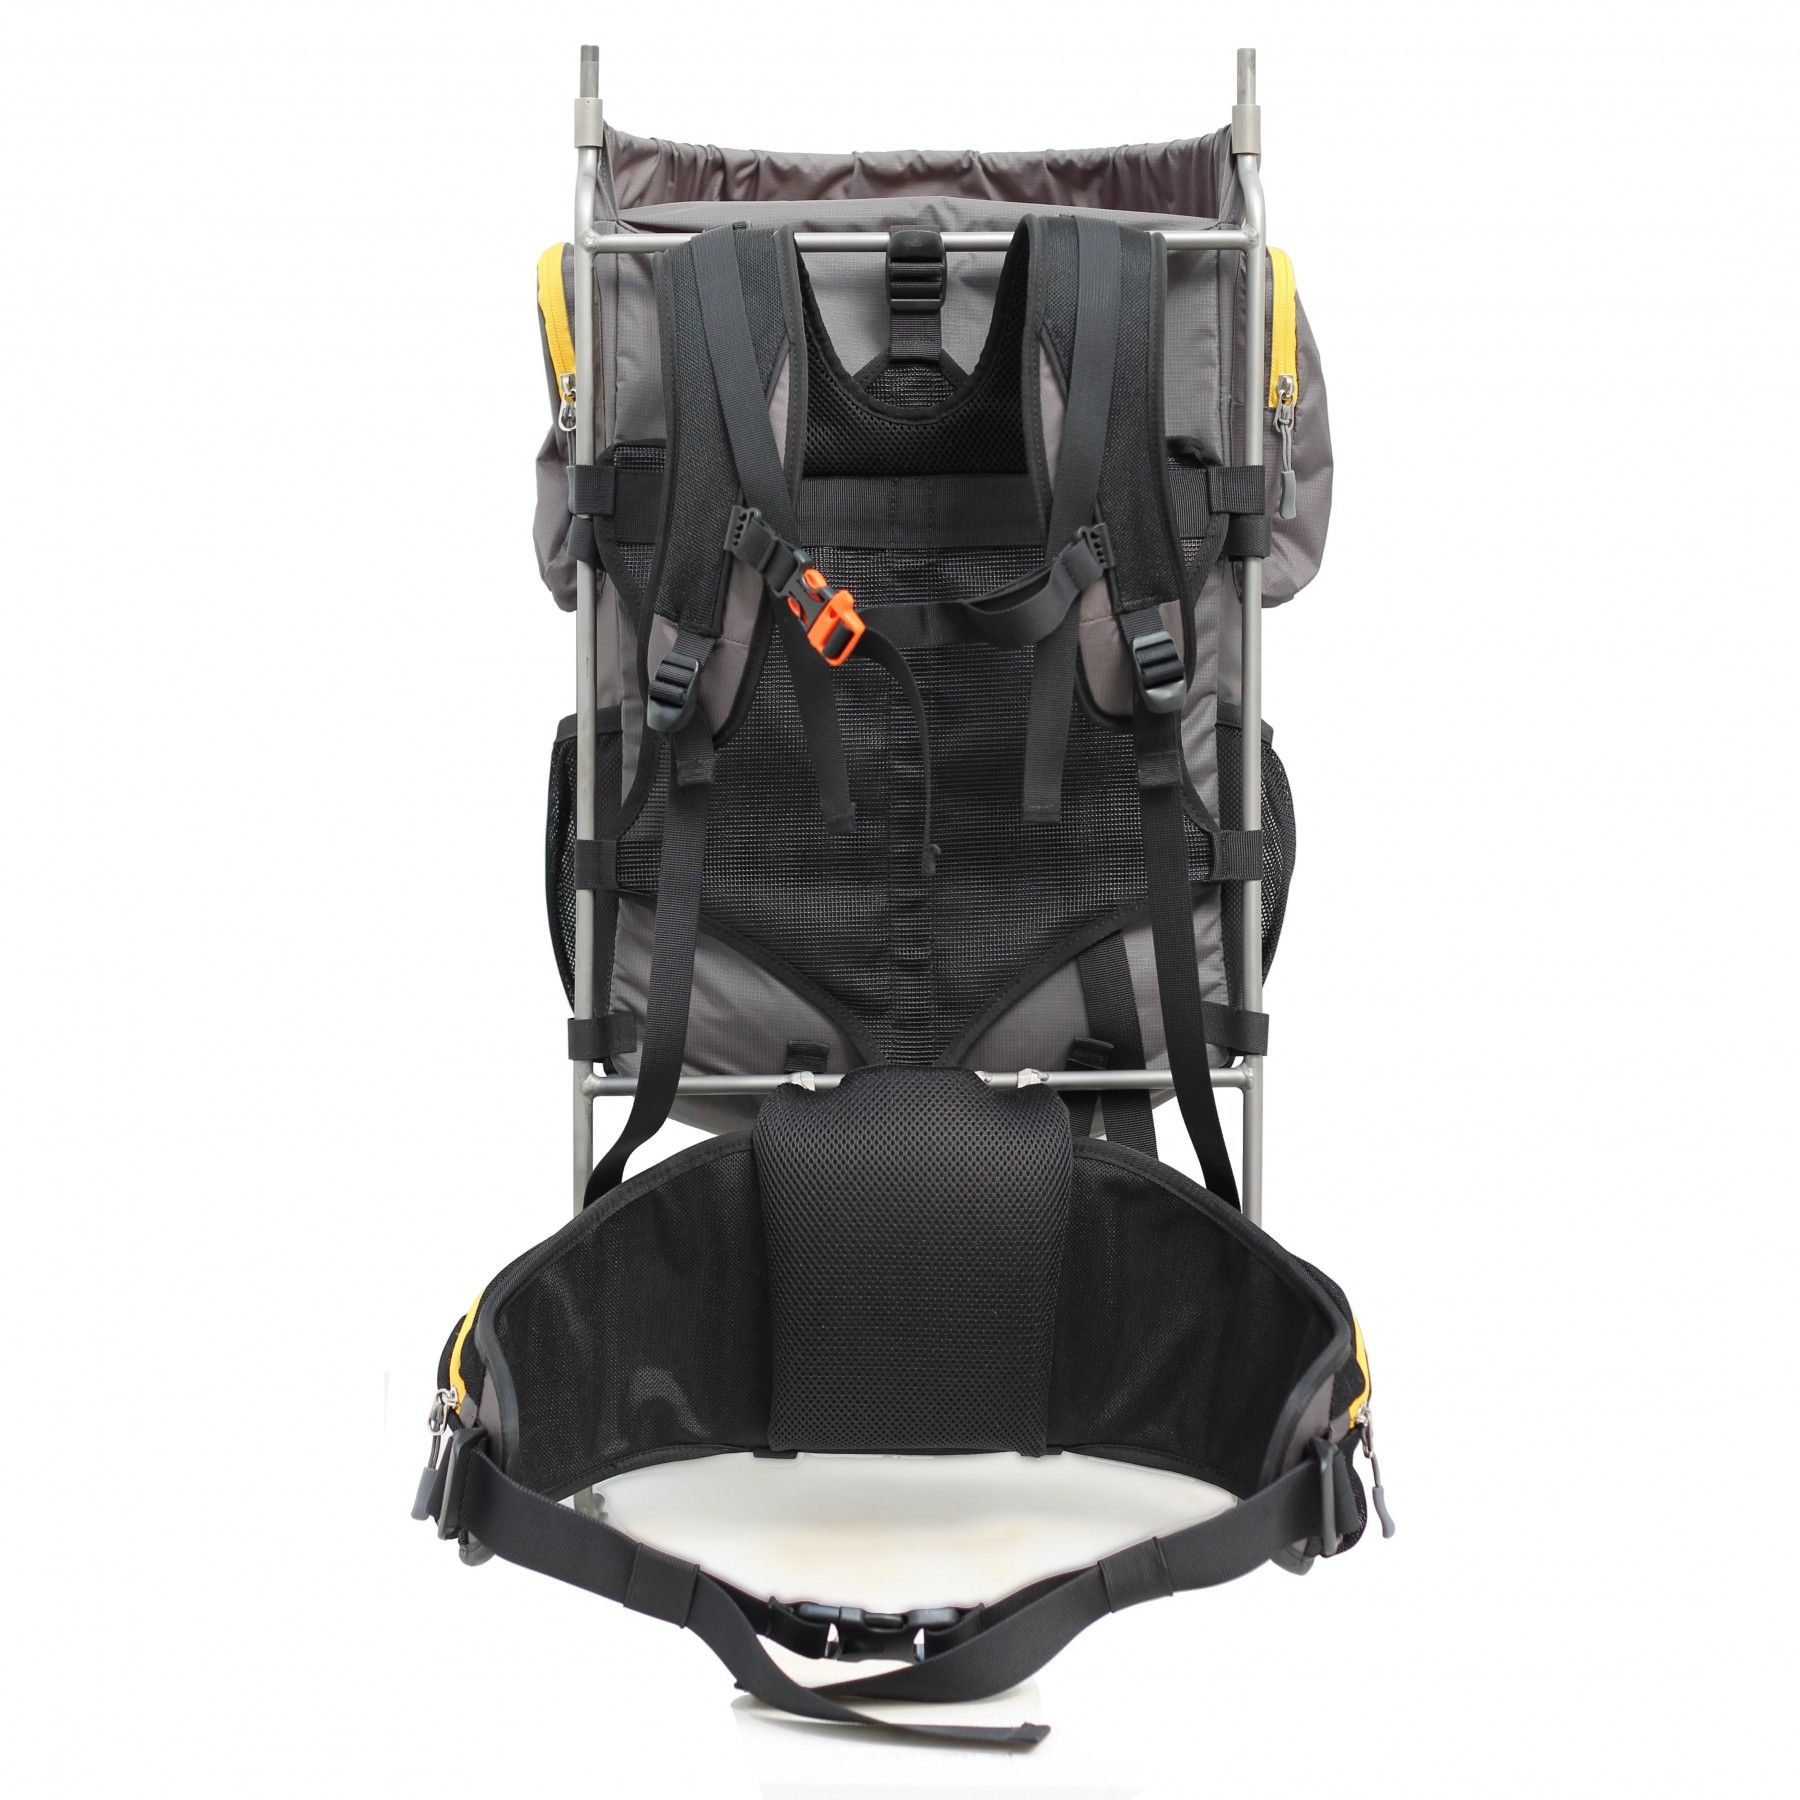 Vargo Ti-Arc Backpack Titanium external frame Ultralight Backpack ...